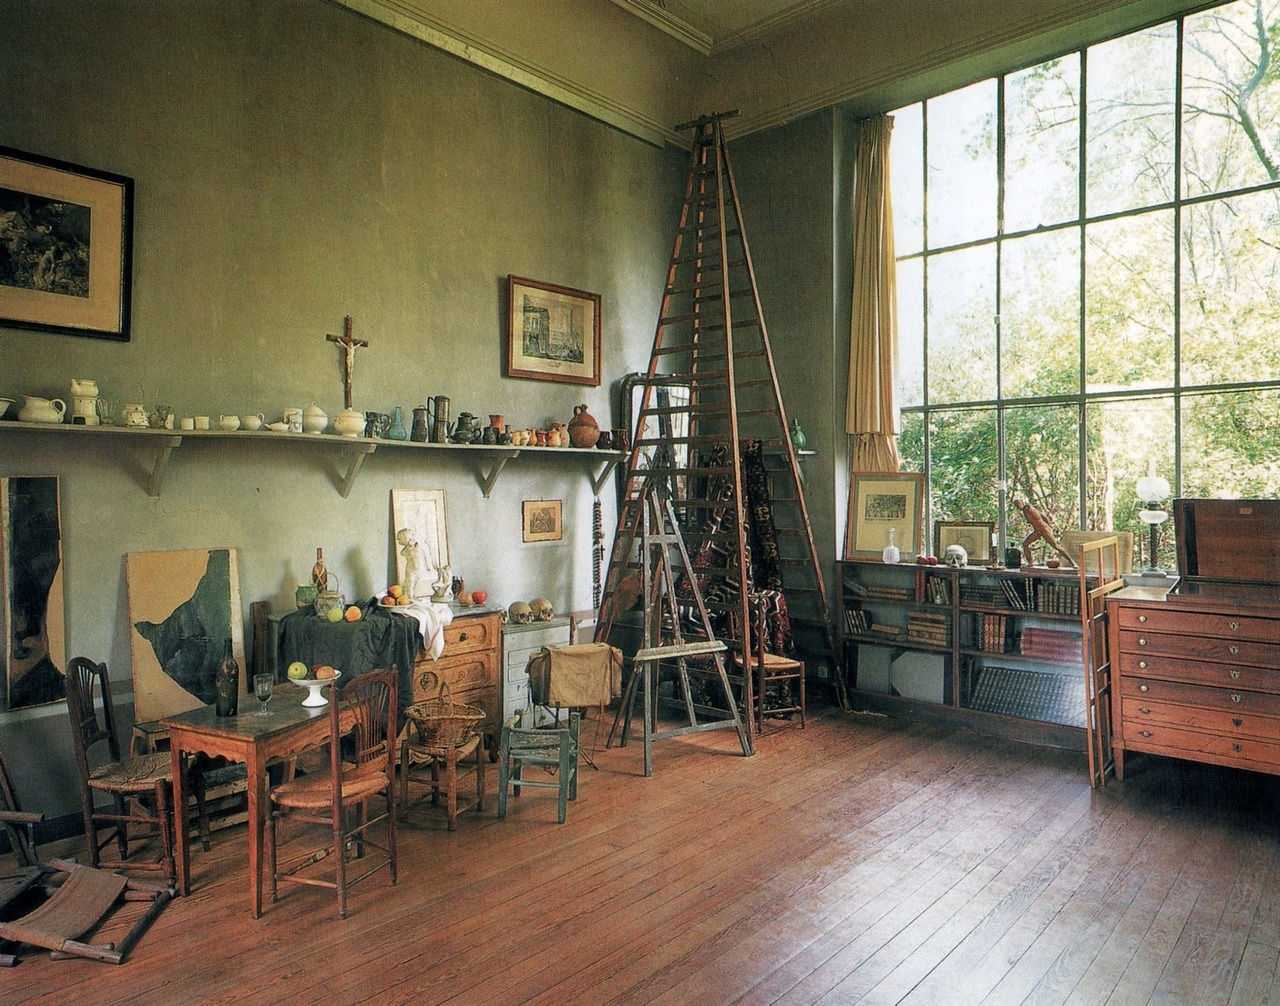 Paul Cézanne's studio in Aix-en-Provence